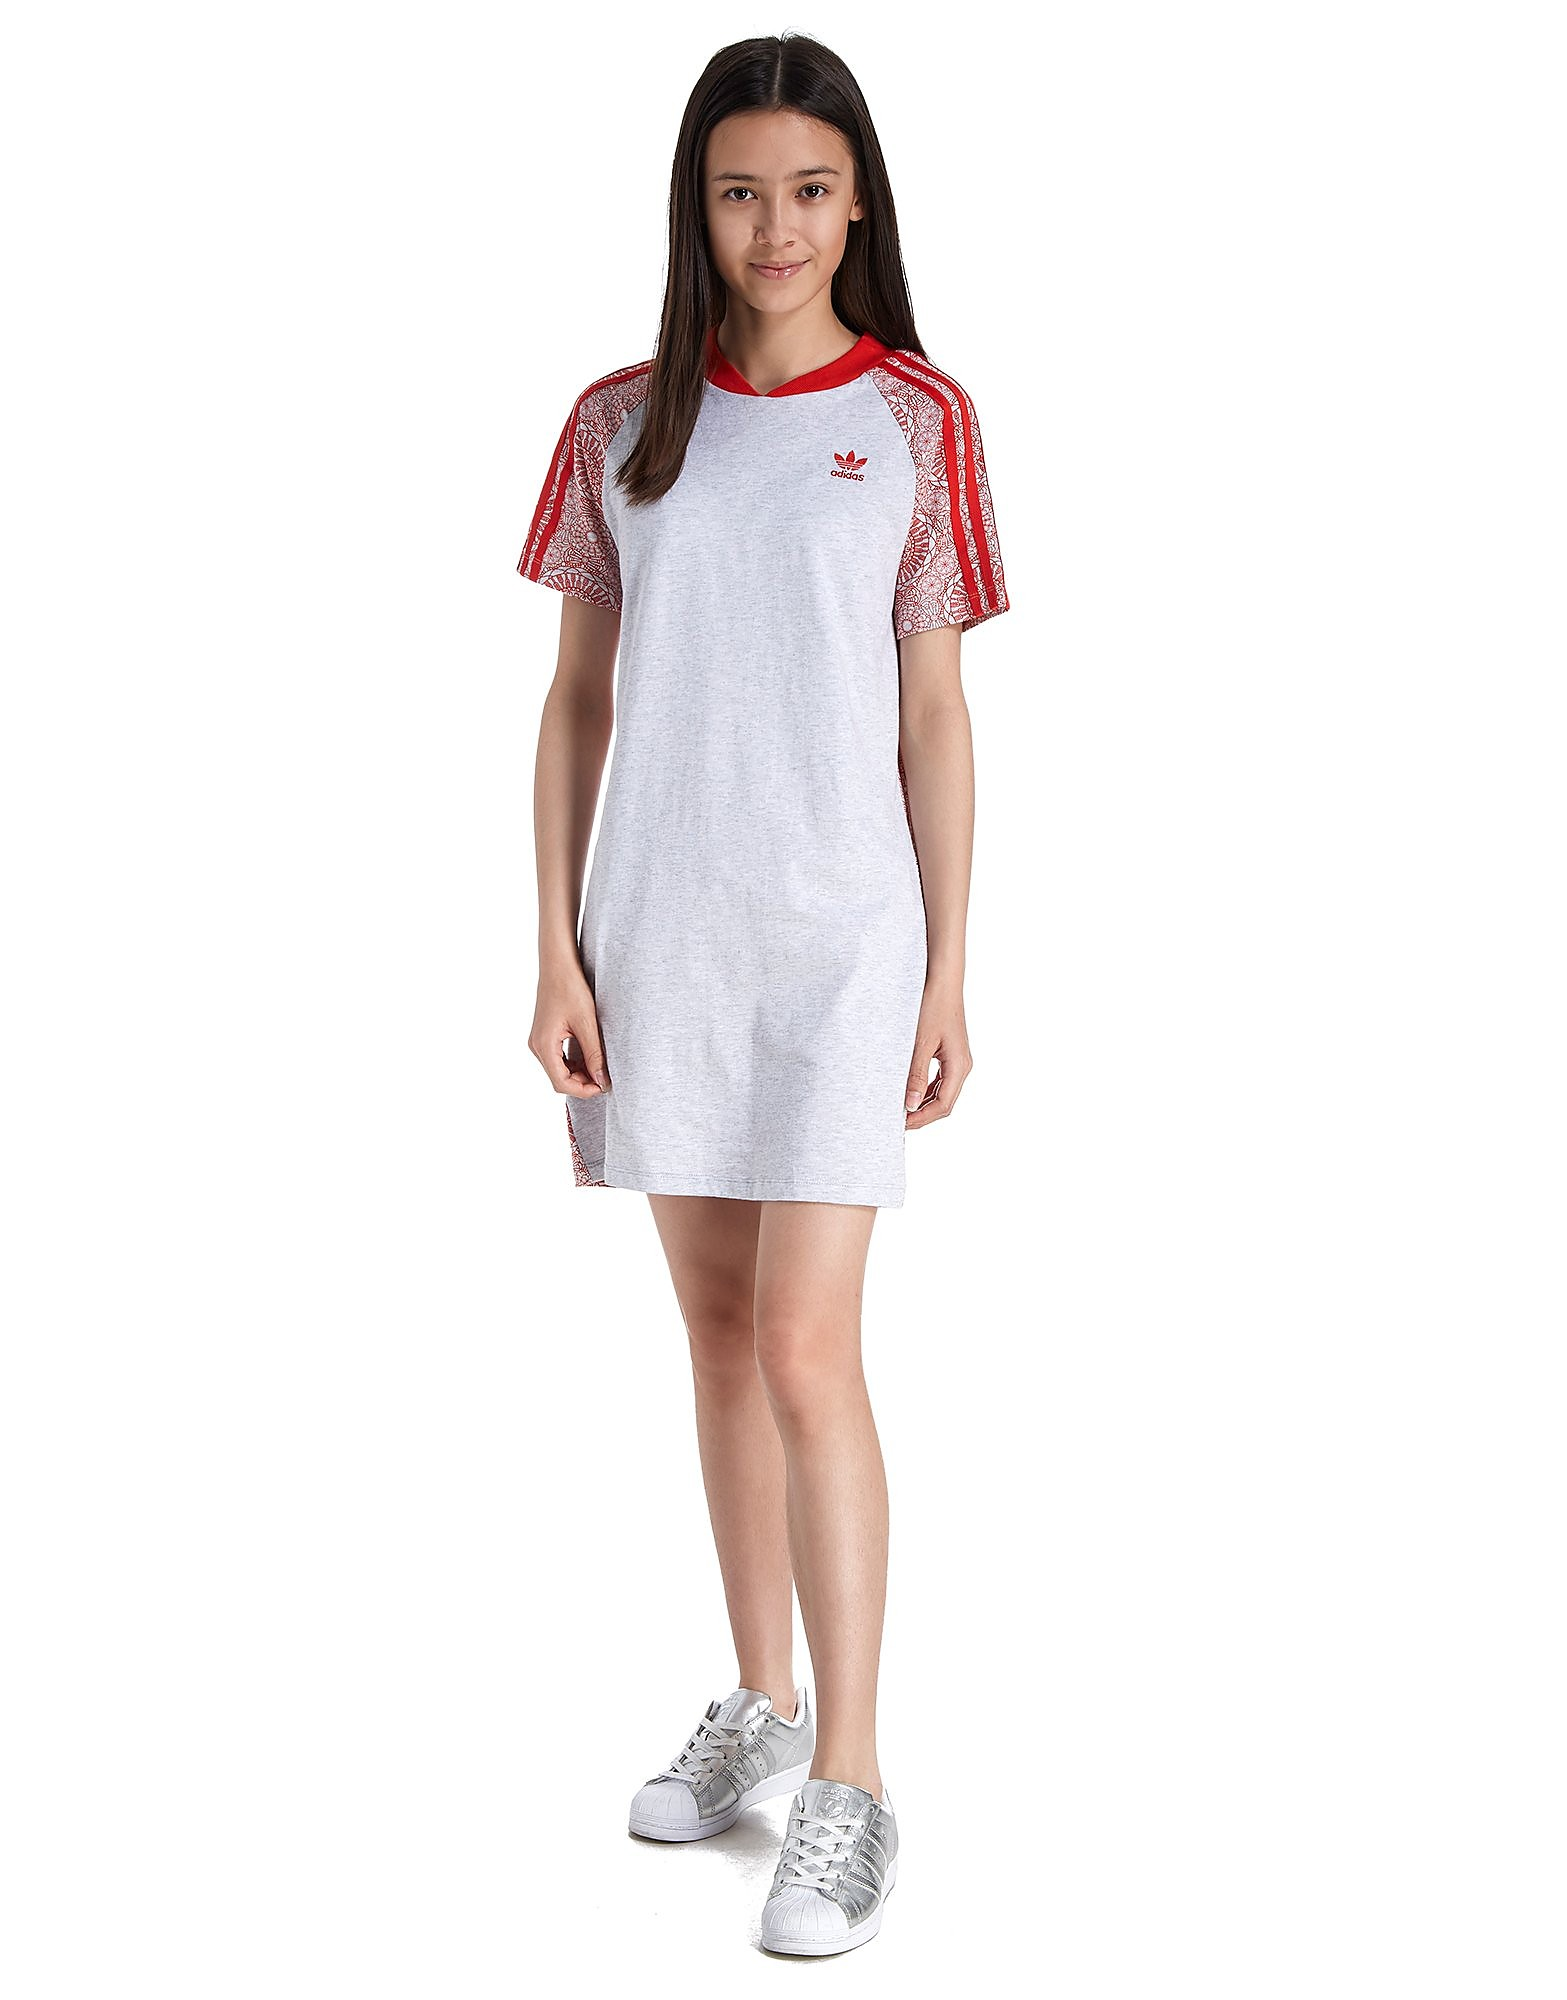 adidas Originals Girls' London T-Shirt Junior